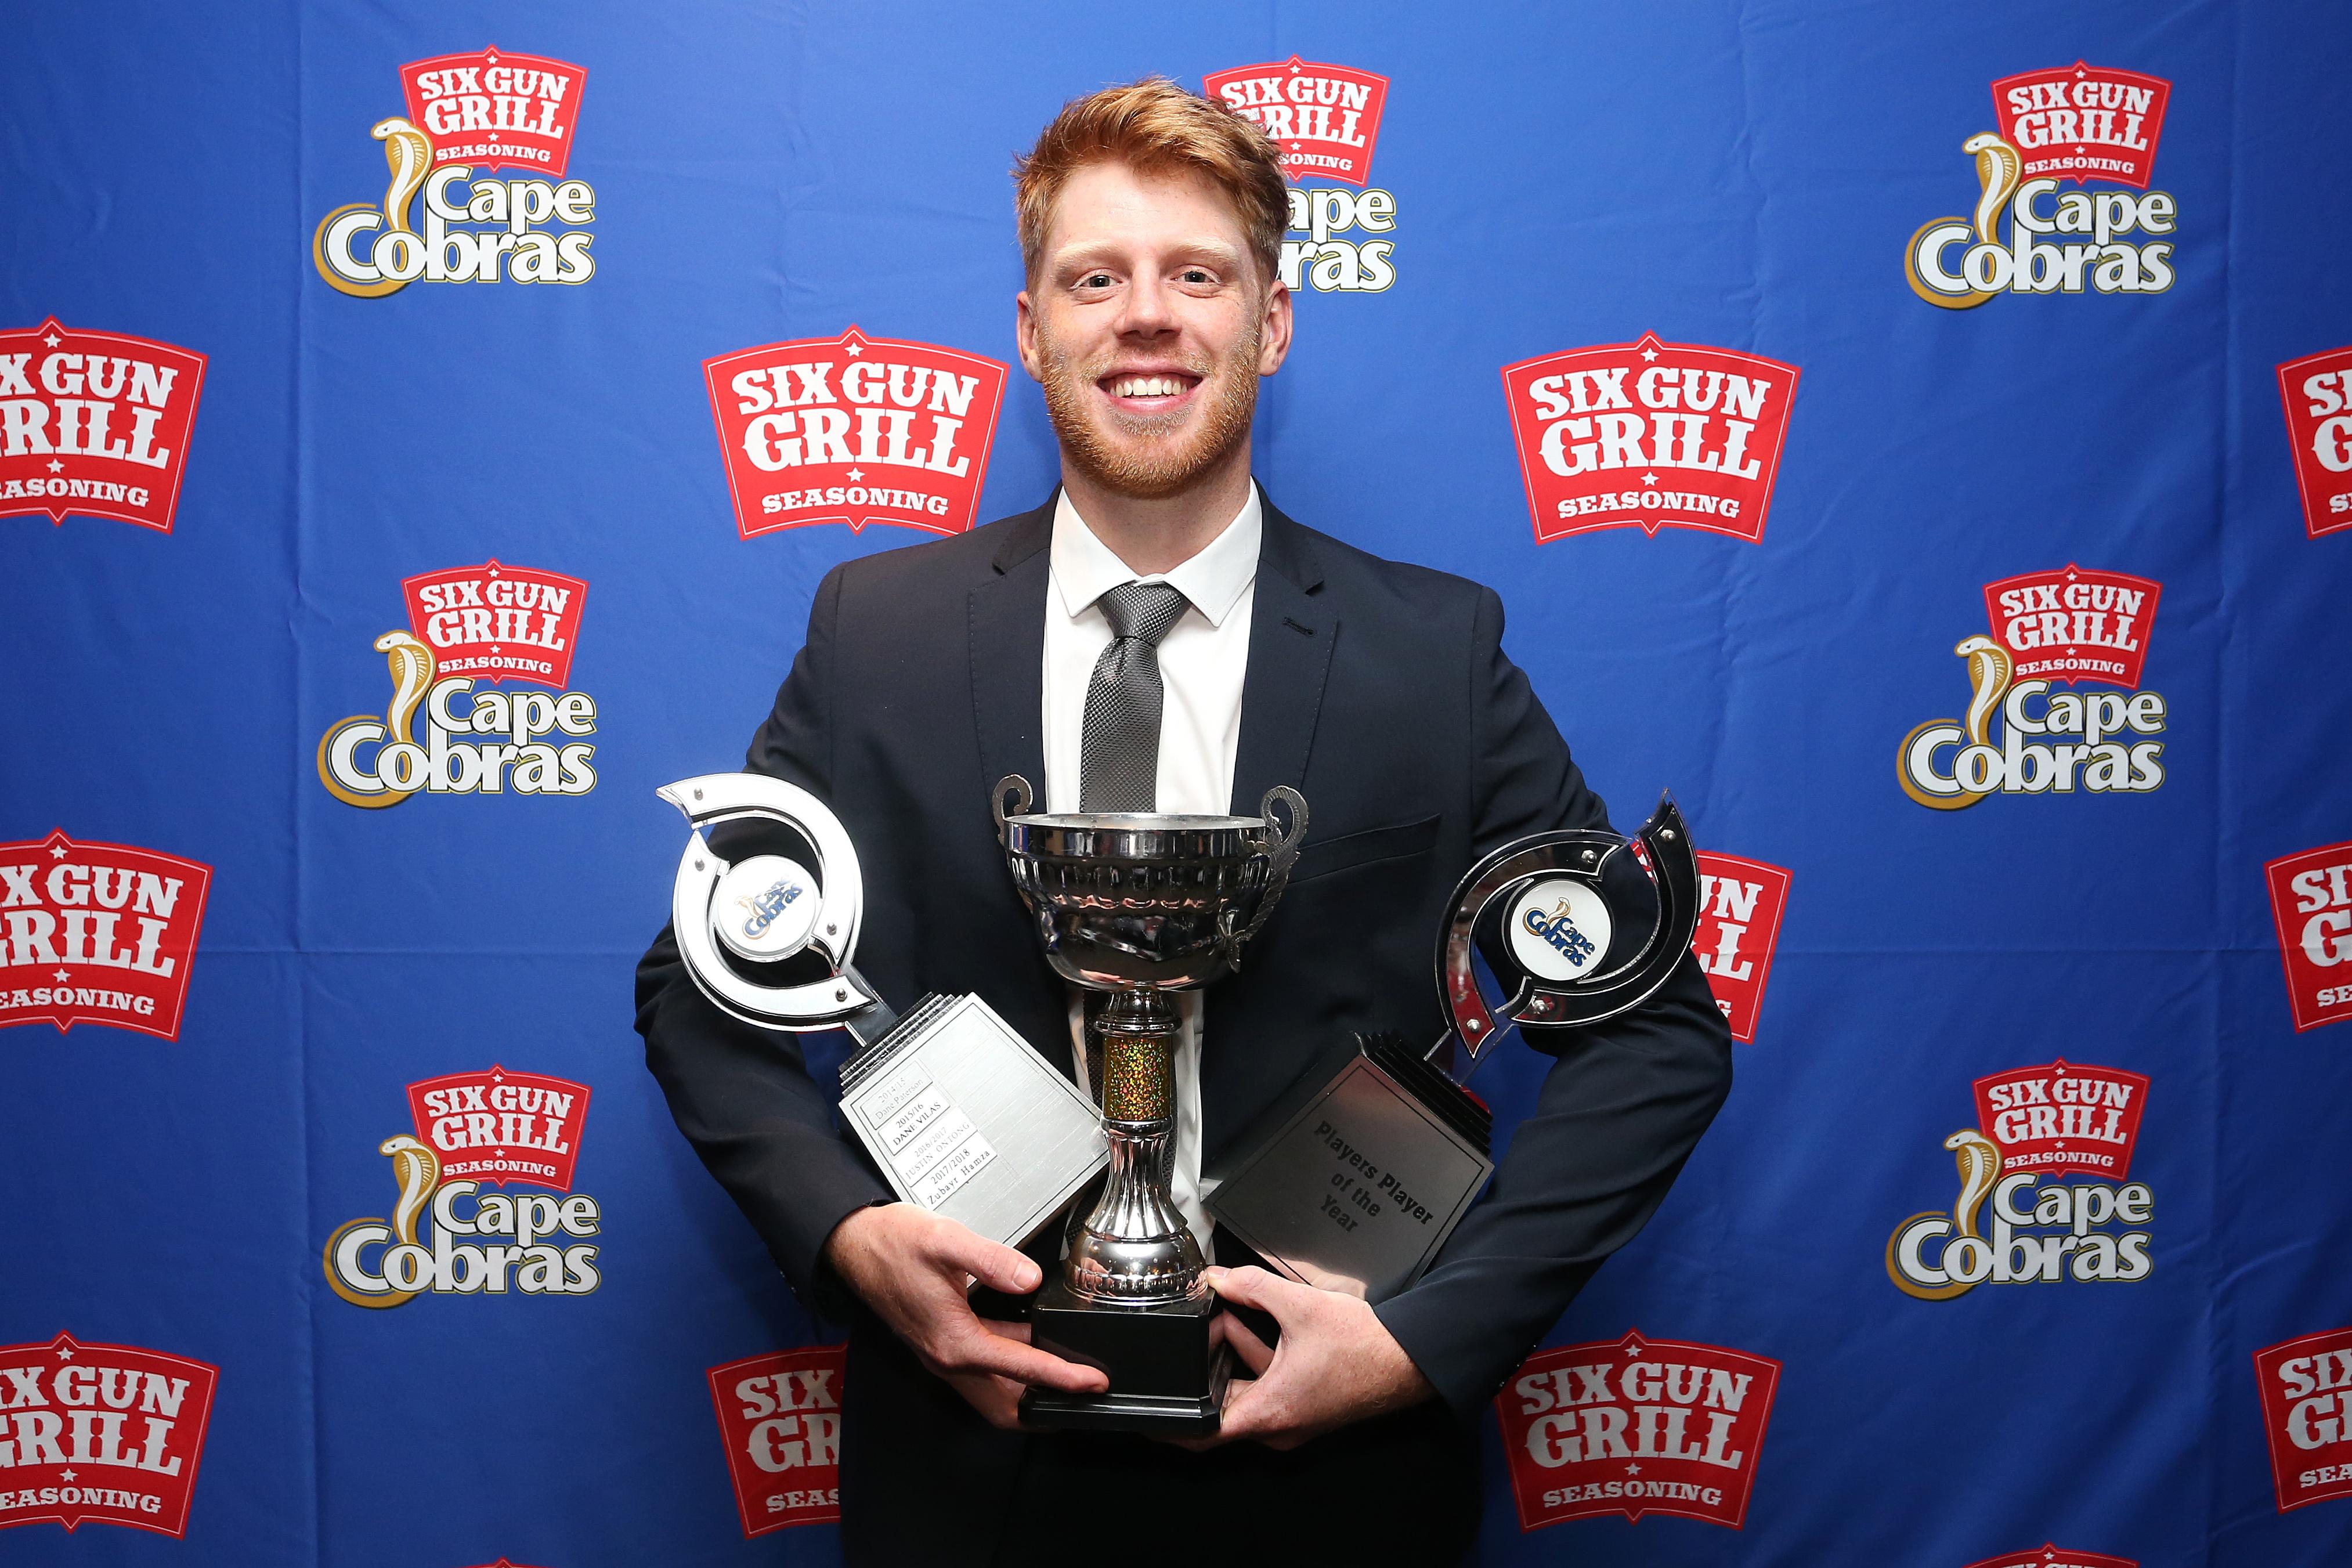 CSA: Verreynne the big winner at Six Gun Grill Cape Cobras End of Season Awards